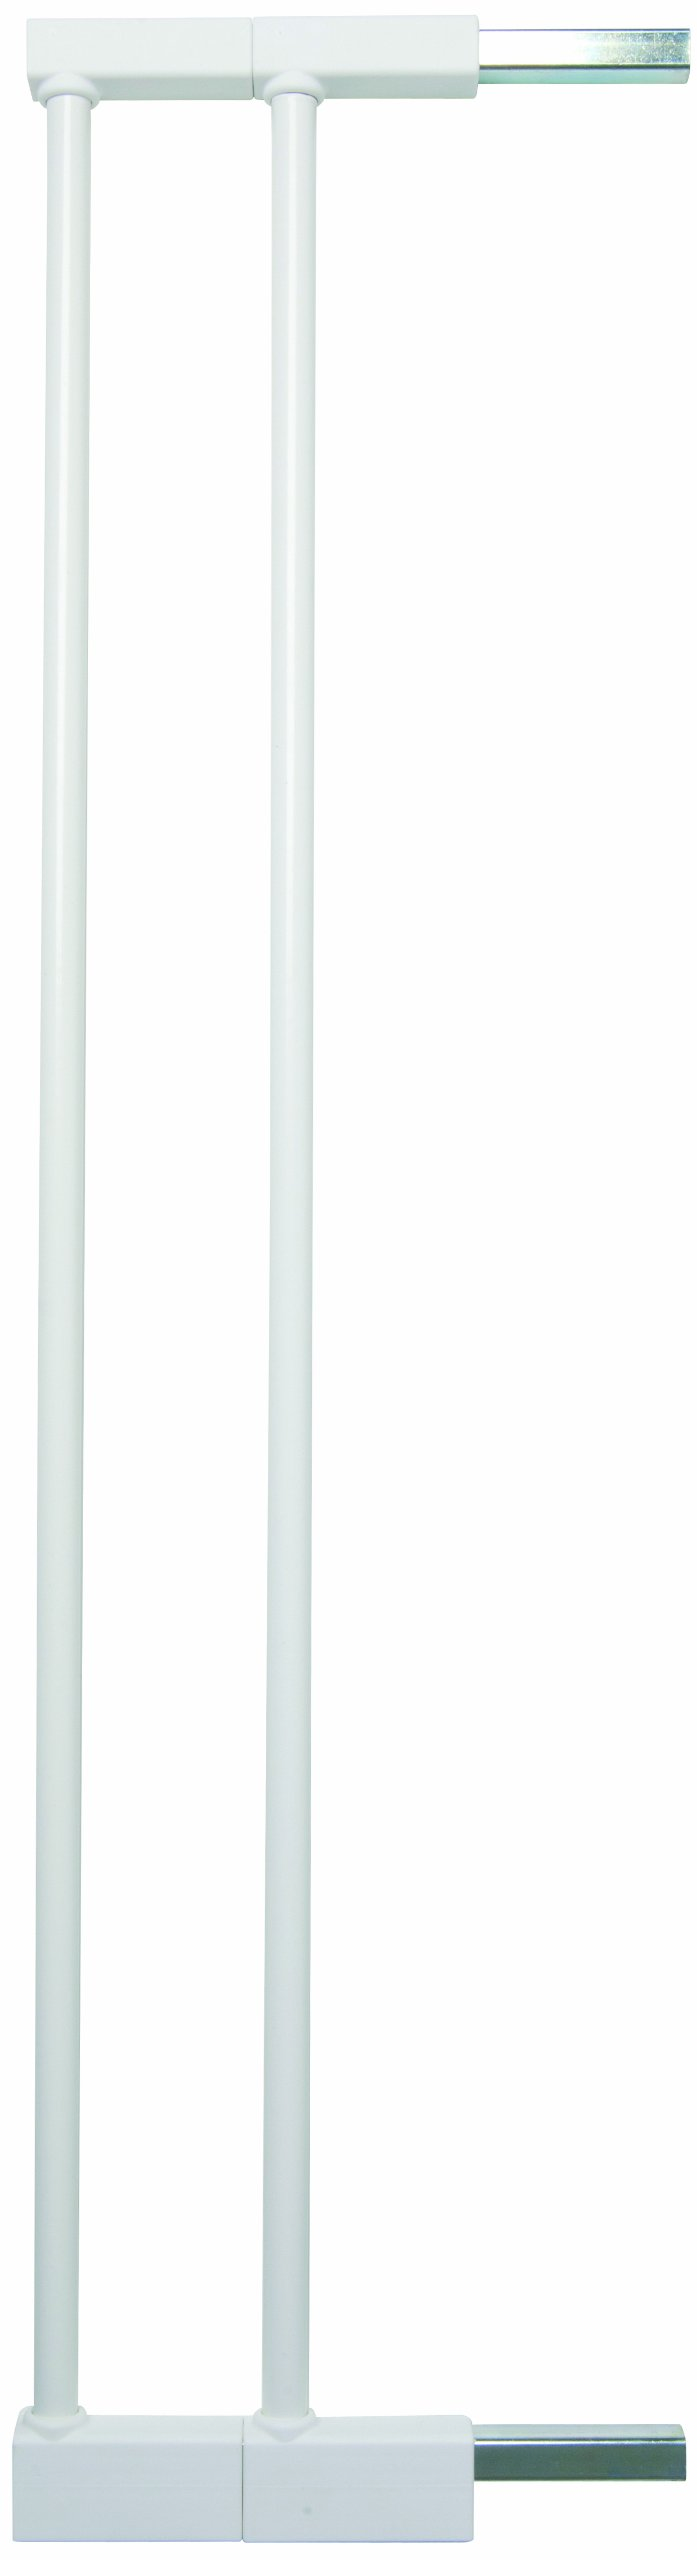 Baby Dan Extend A Gate 58014-5400-10-85 2 Extensions for Premier, Pressure Fit, Danamic and Two Way Autoclose Safety Gates 2 x 7 cm White Baby Dan Verlängerungen für druckmontierte Schutzgitter 2 bar extension set Made of powder coated metal Made in Denmark 2